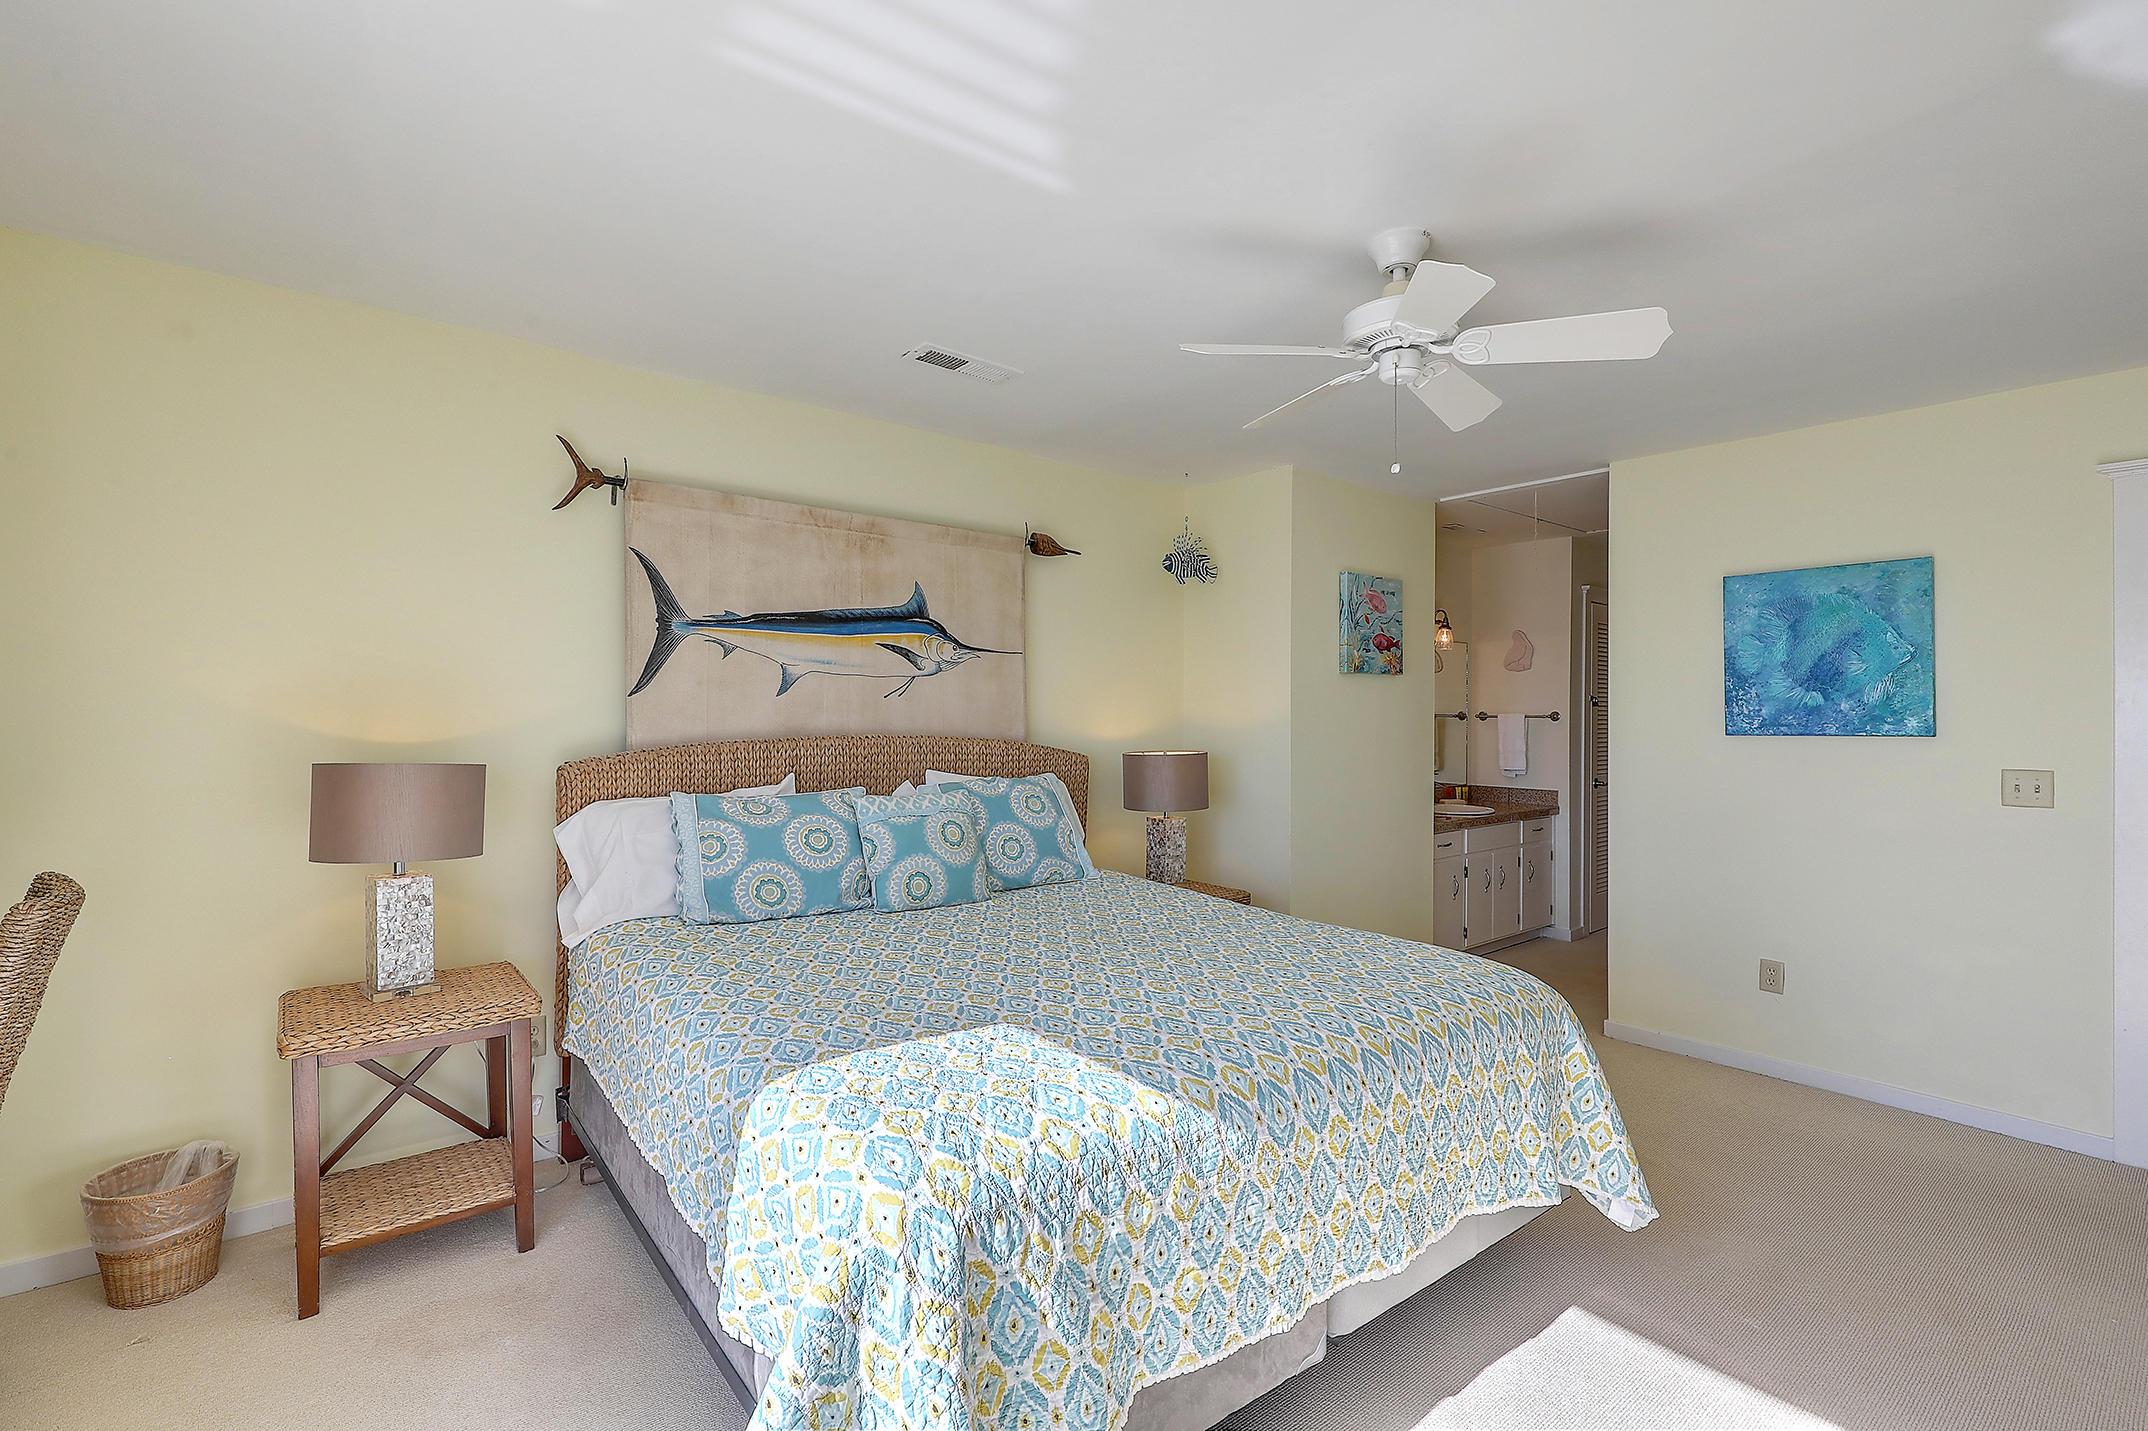 Wild Dunes Homes For Sale - 14 Beachwood East, Isle of Palms, SC - 29